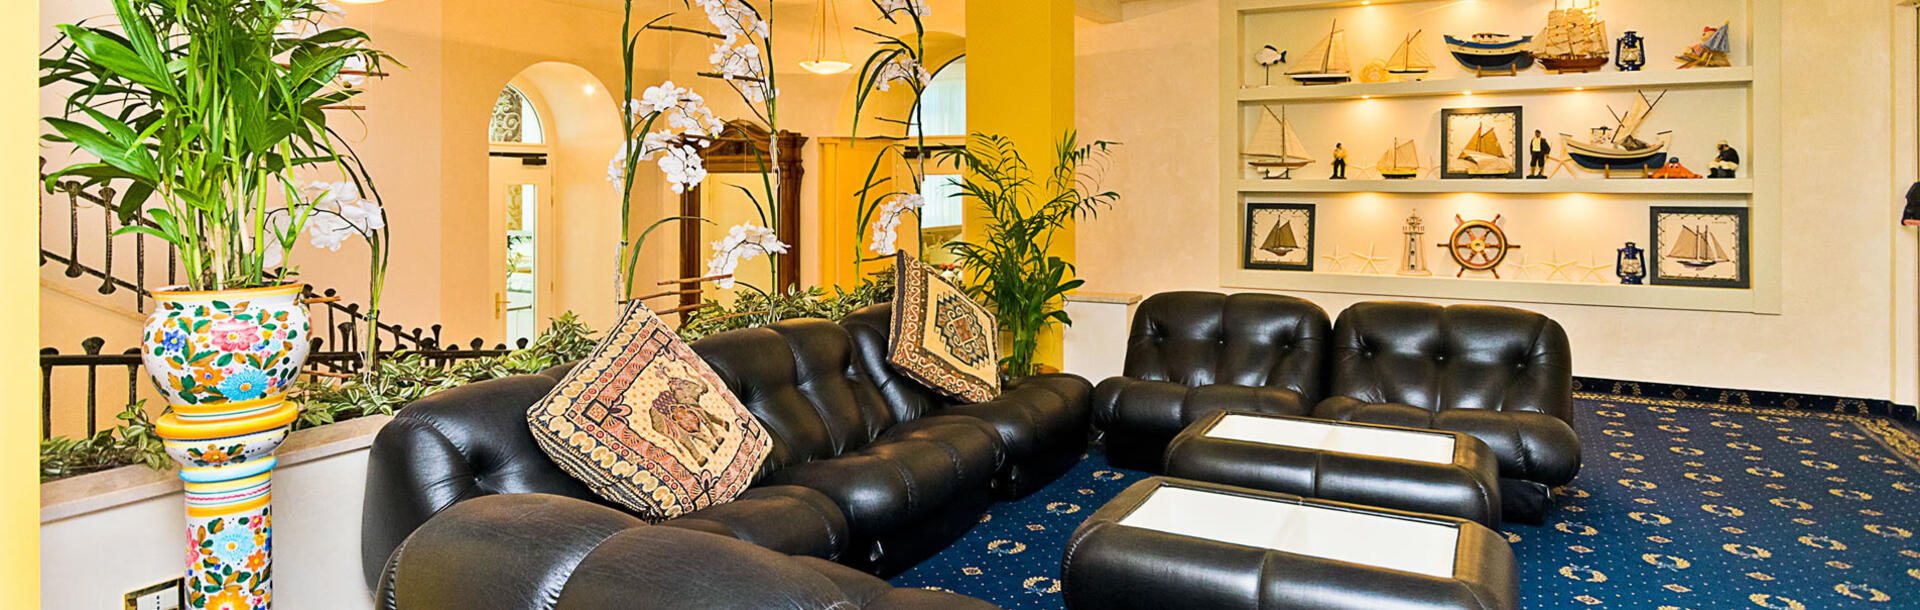 hotel-montecarlo it virtual-tour 013